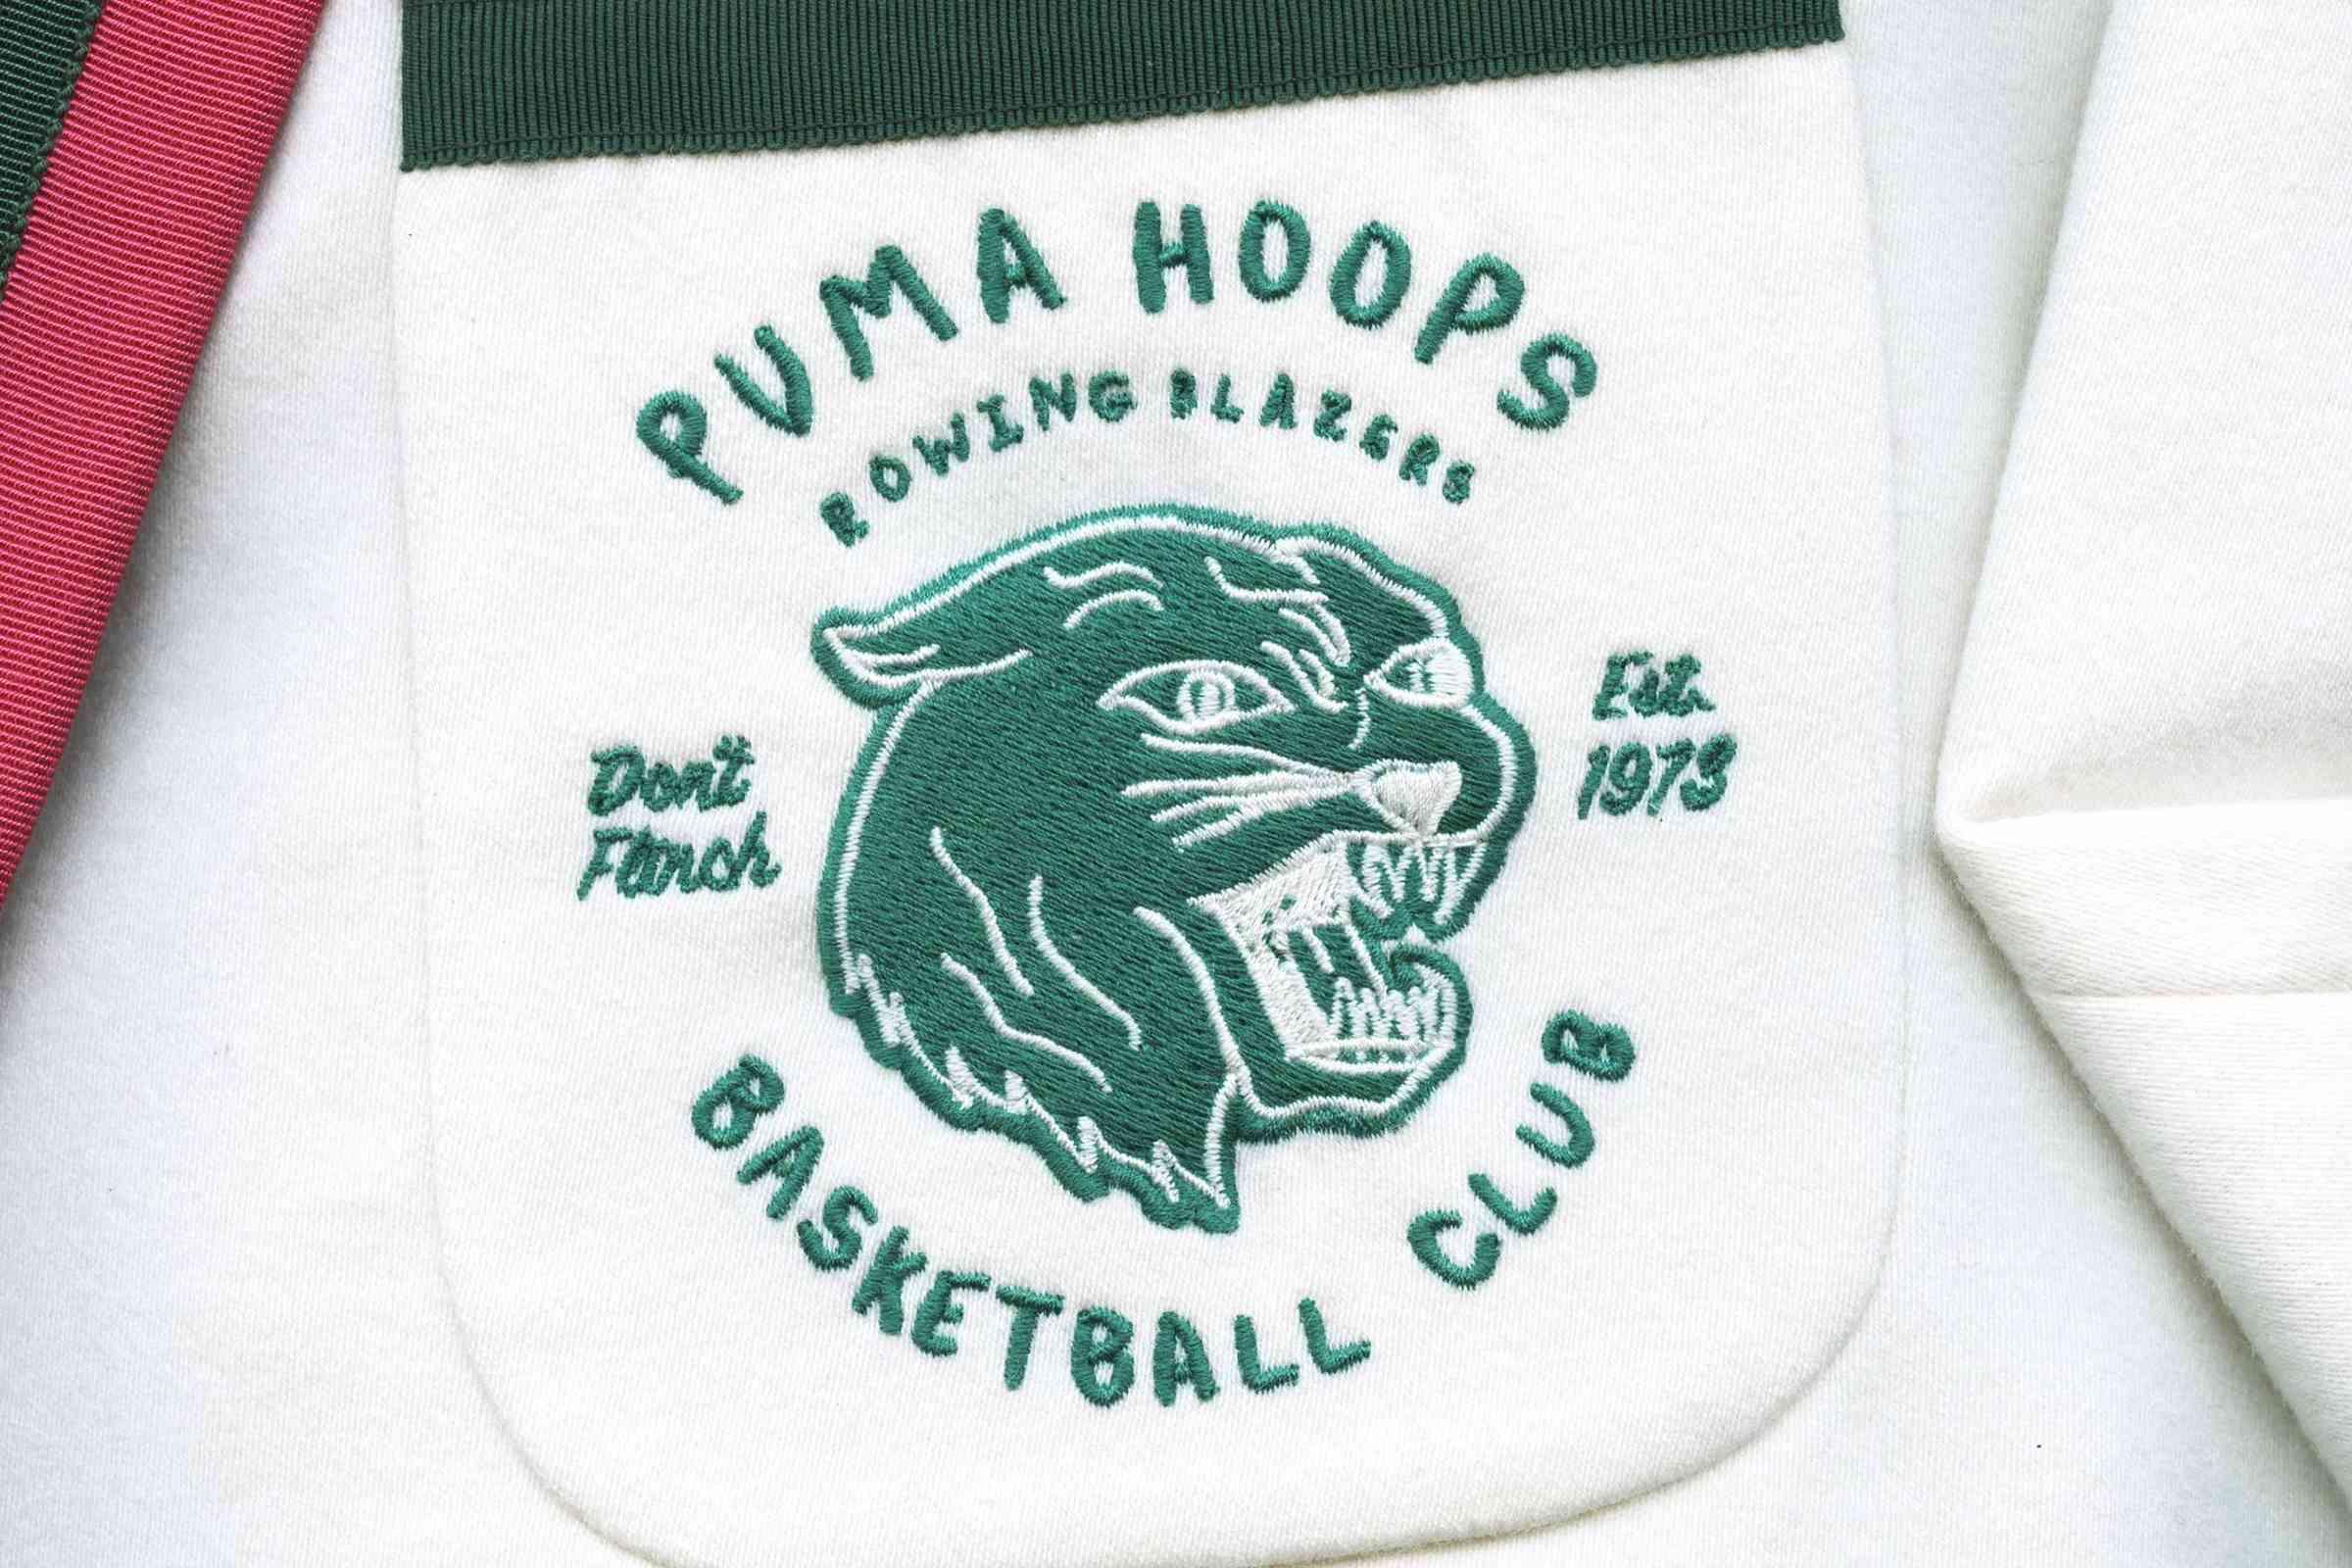 PUMA Hoops - Clyde Hardwood, Banner